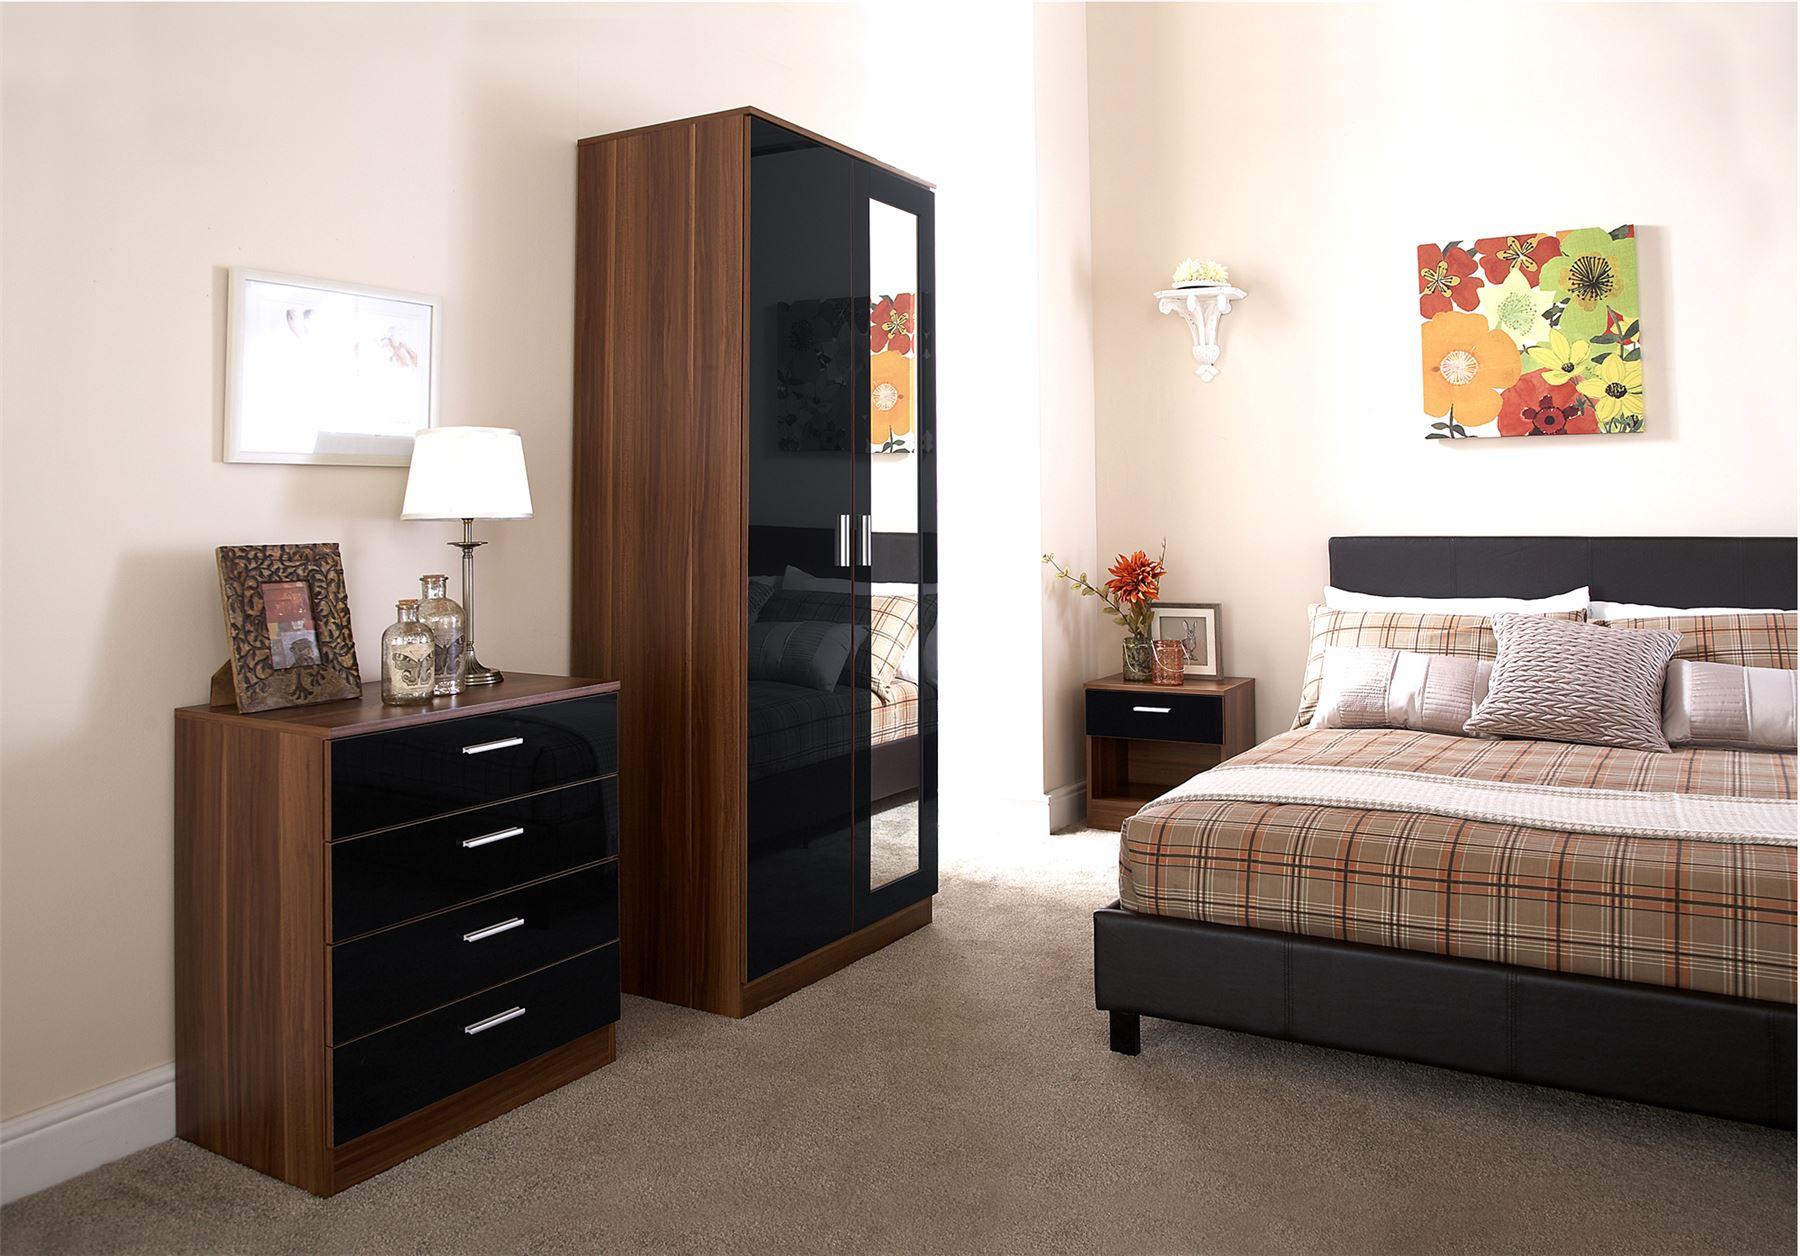 BEDROOM FURNITURE 3 PIECE SET BLACK GLOSS & WALNUT WARDROBE BEDSIDE DRAWE